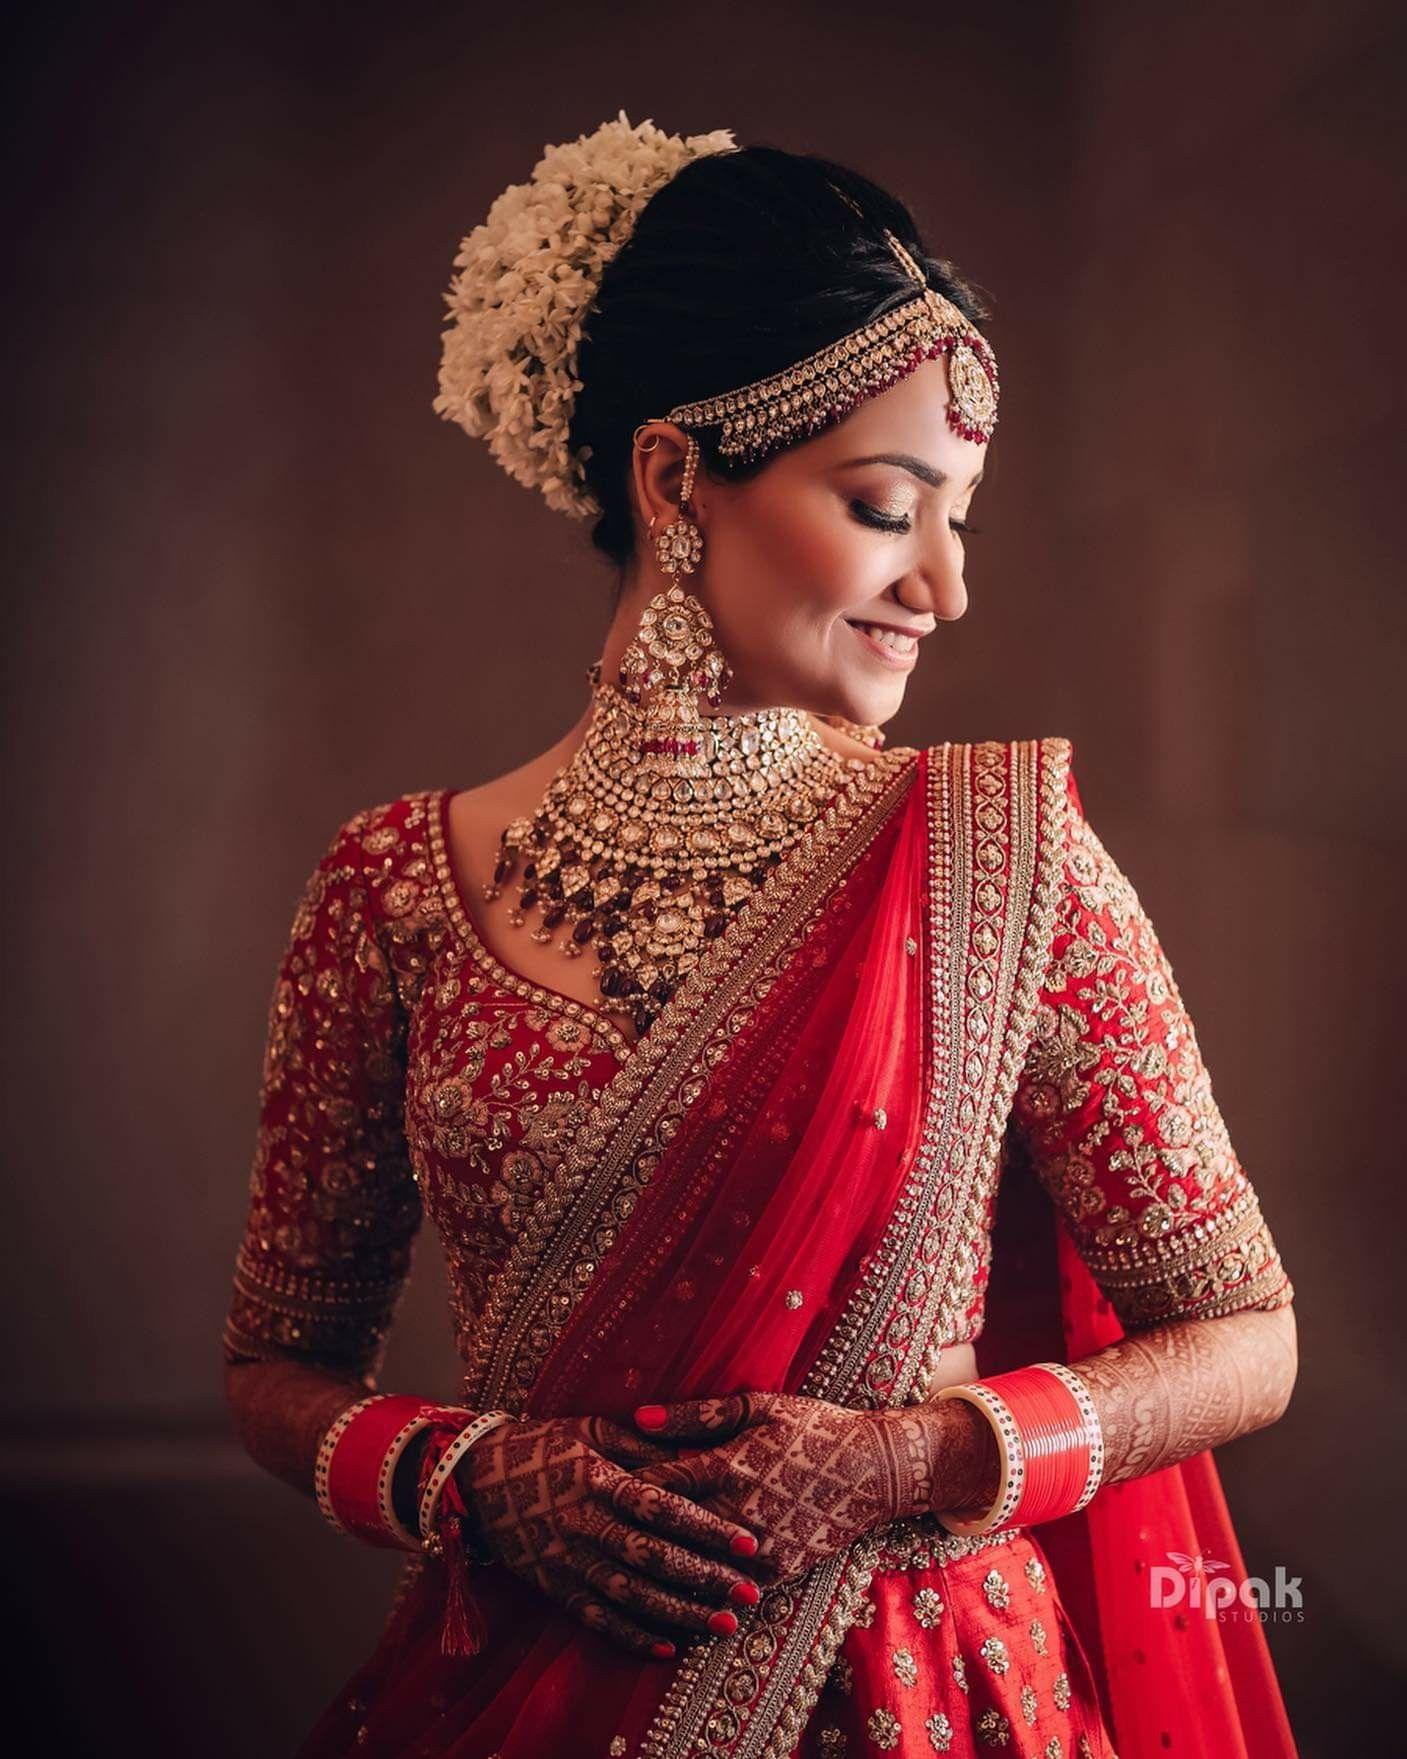 Pin by Deepika padukone on Indian wedding photography ...